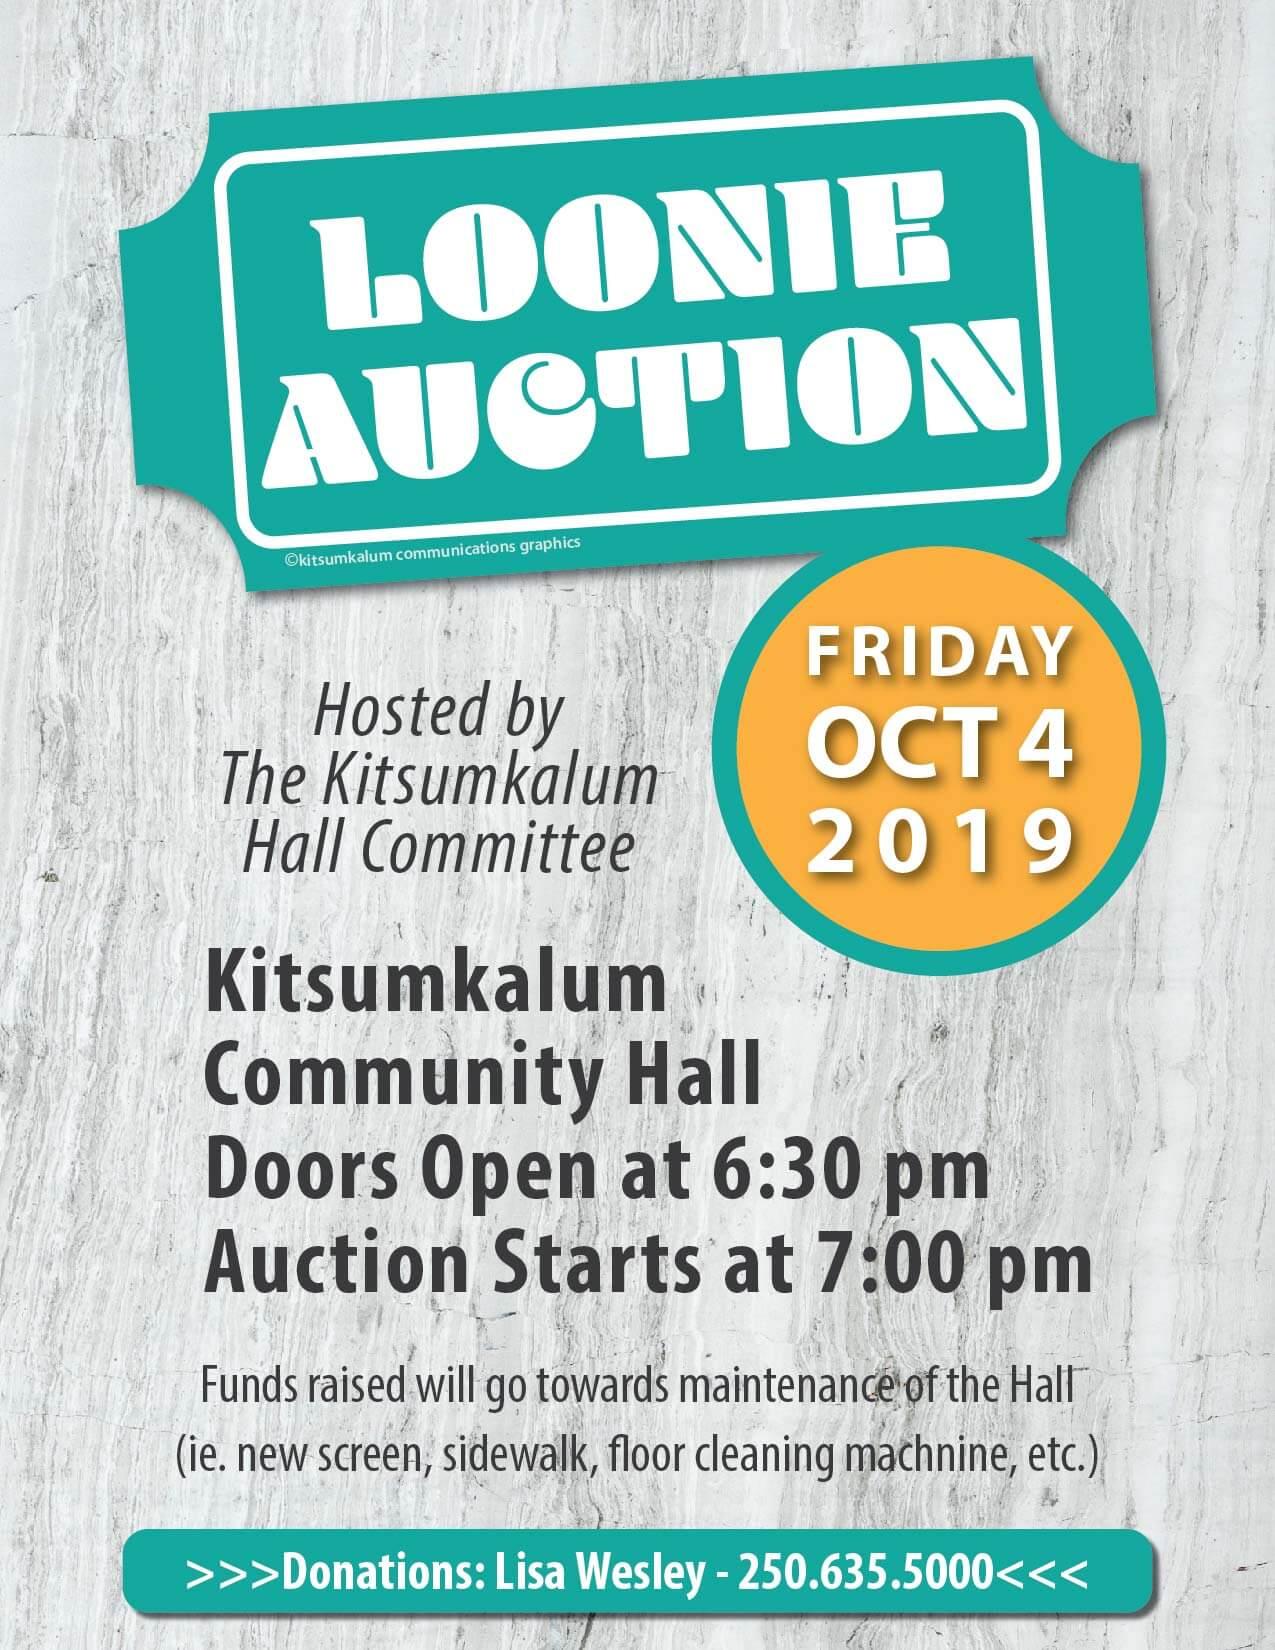 Loonie Auction FRIDAY OCT 4 Kitsumkalum Hall